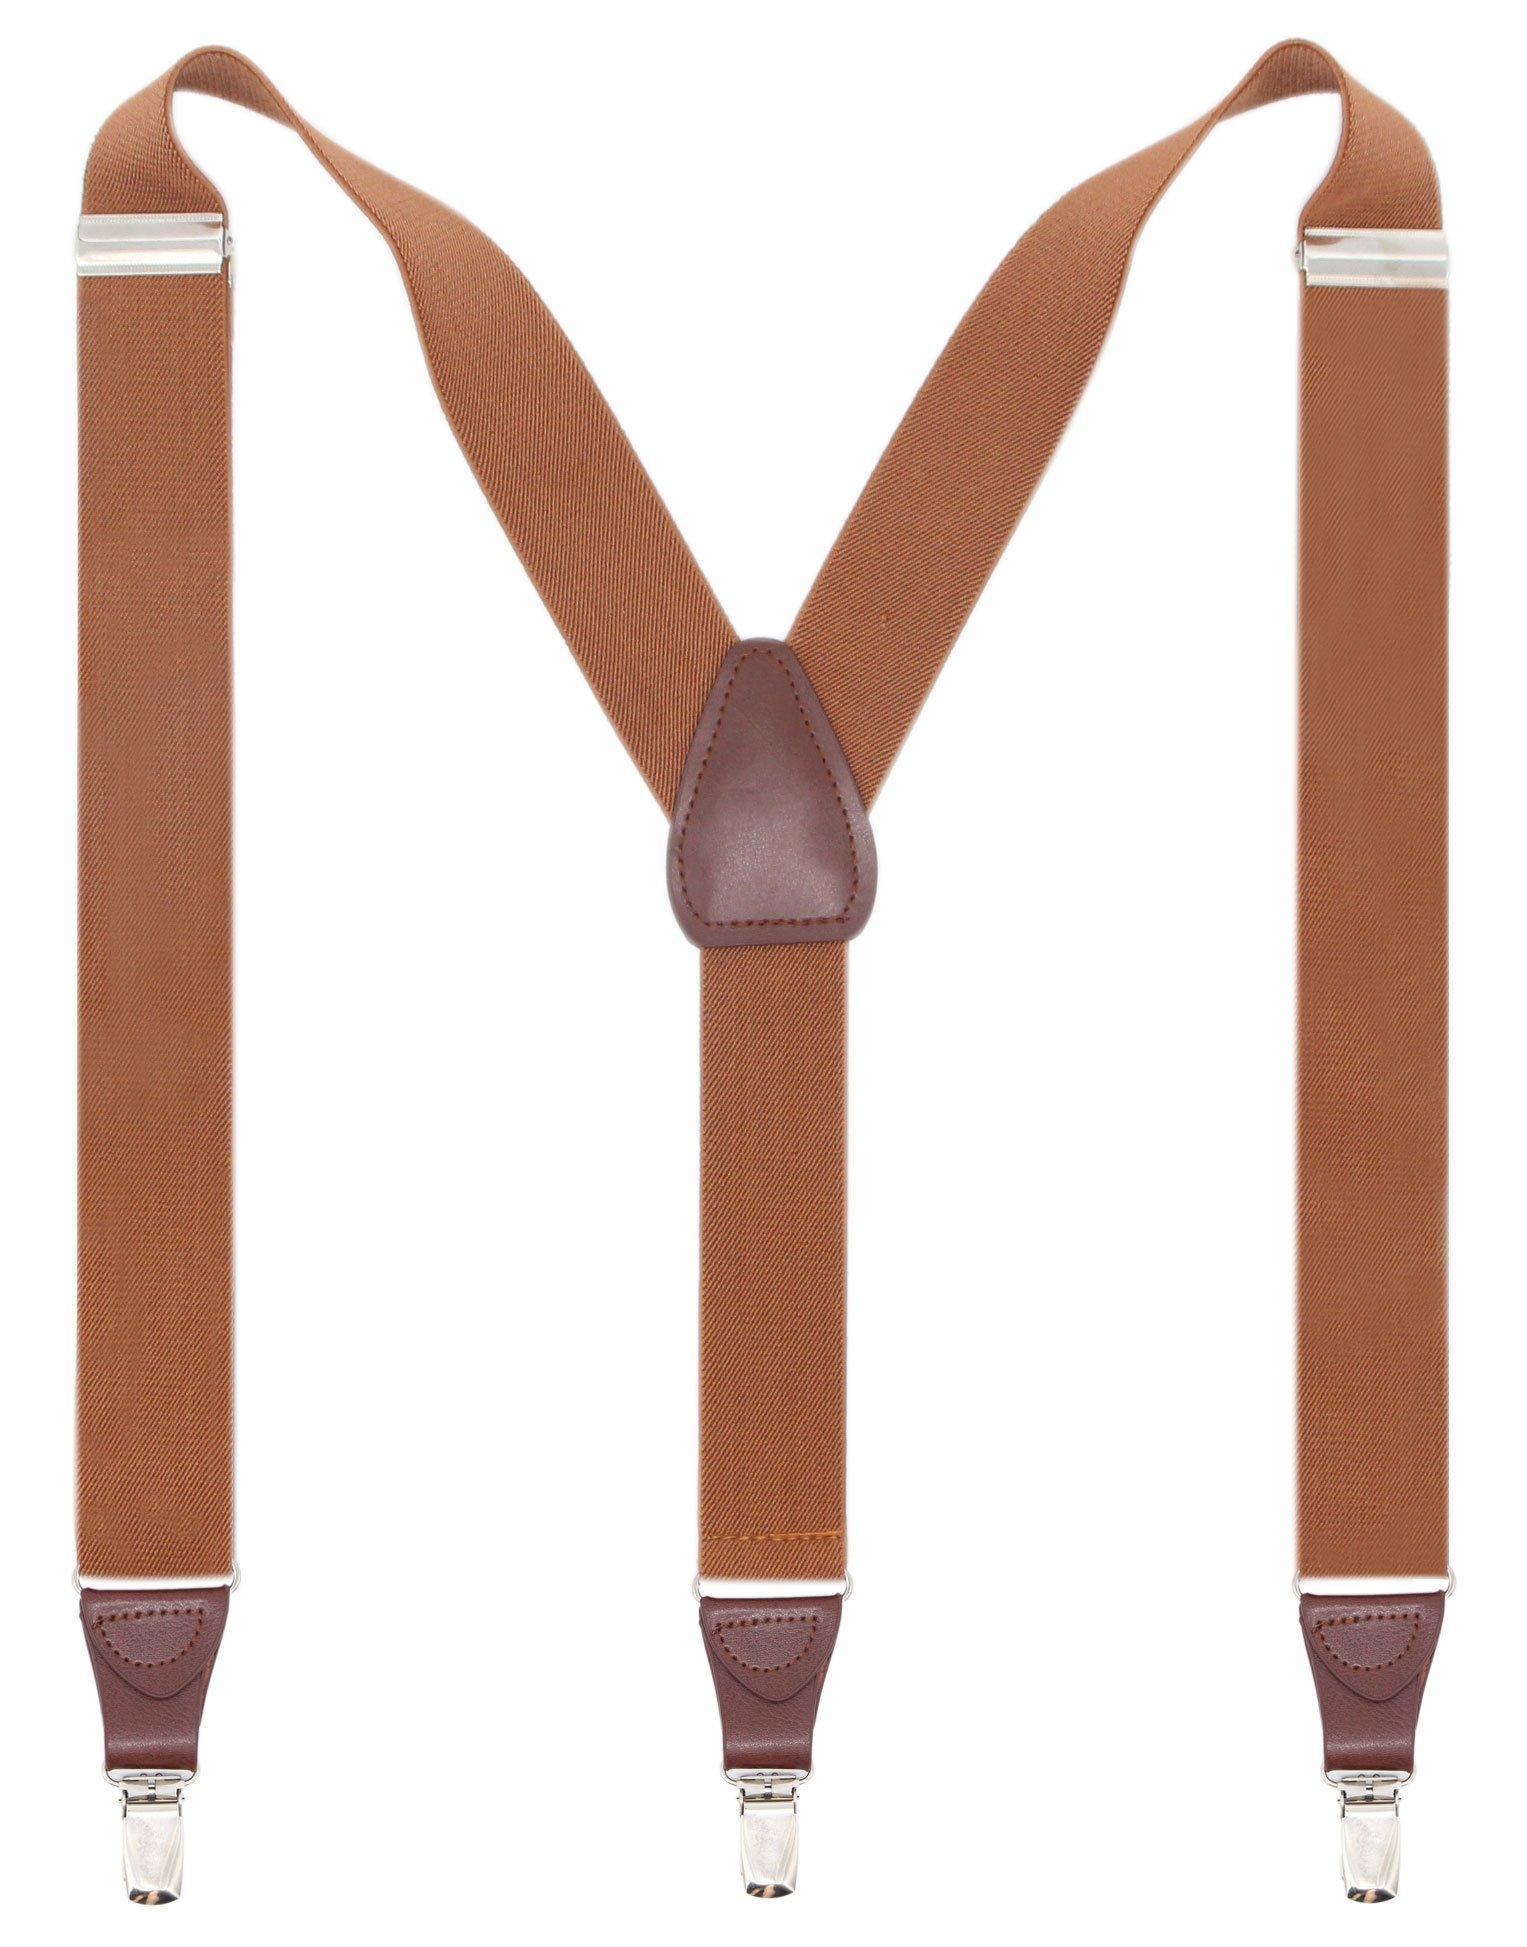 Bioterti Men's Y-shape 1.4 Inch Suspender -3 Metal Clips, Elastic Straps (Camel)